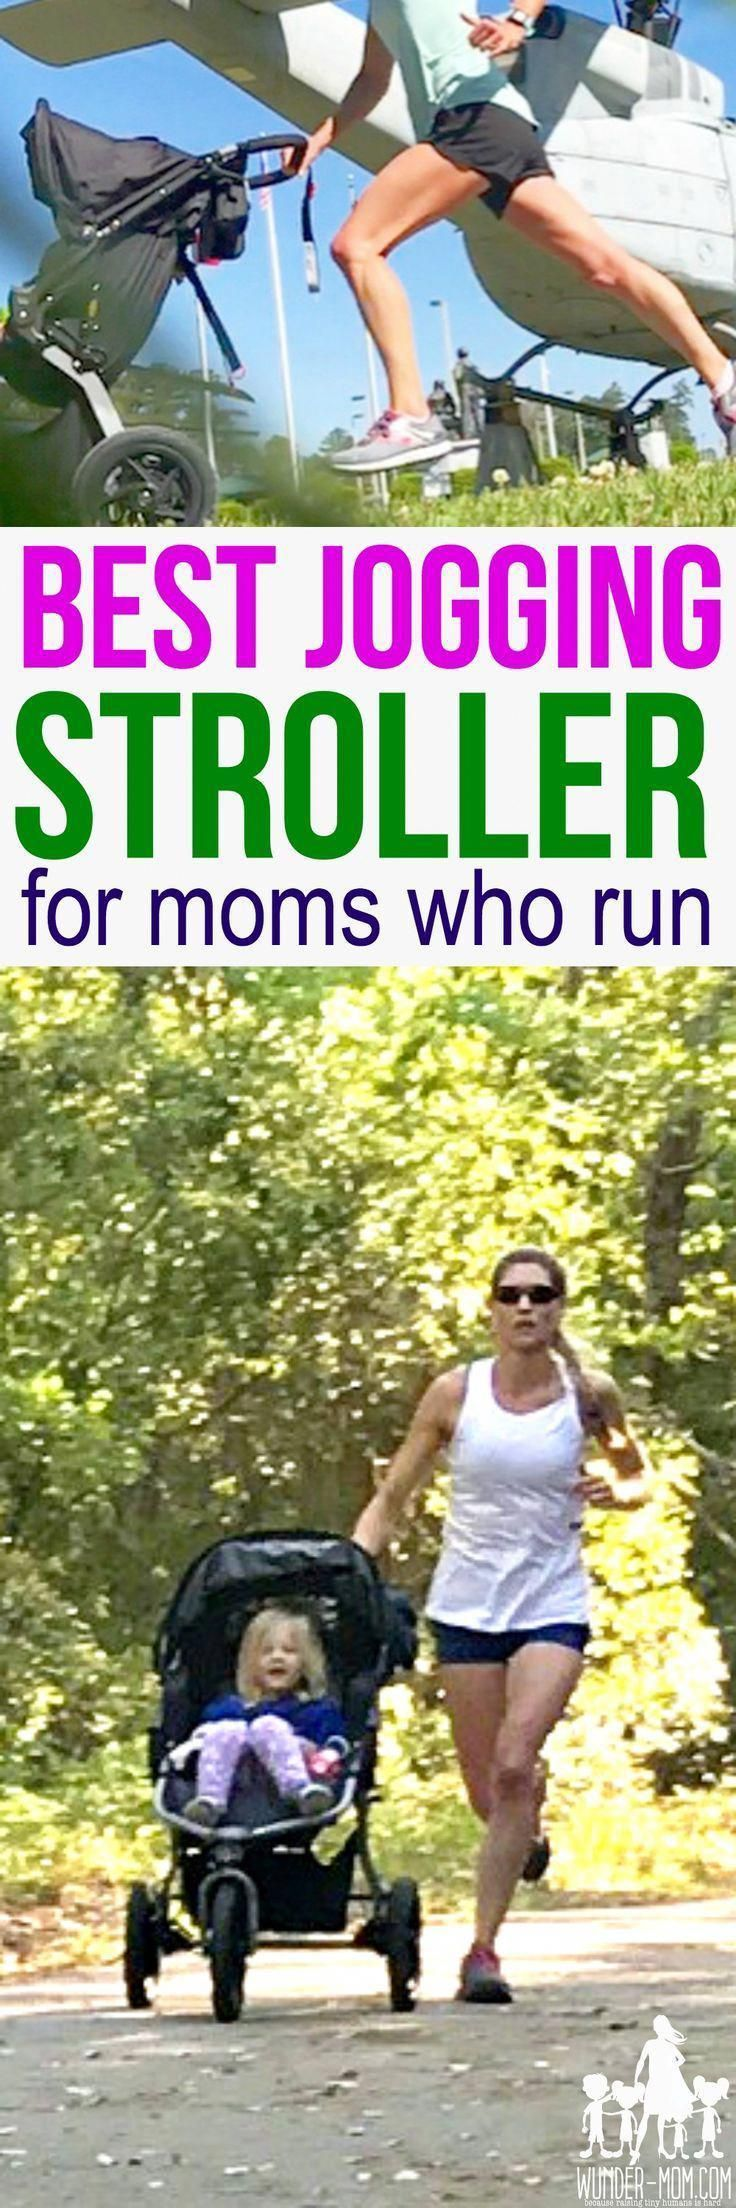 best jogging stroller for moms who run - check out our must have jogging stroller, perfect for mothe...